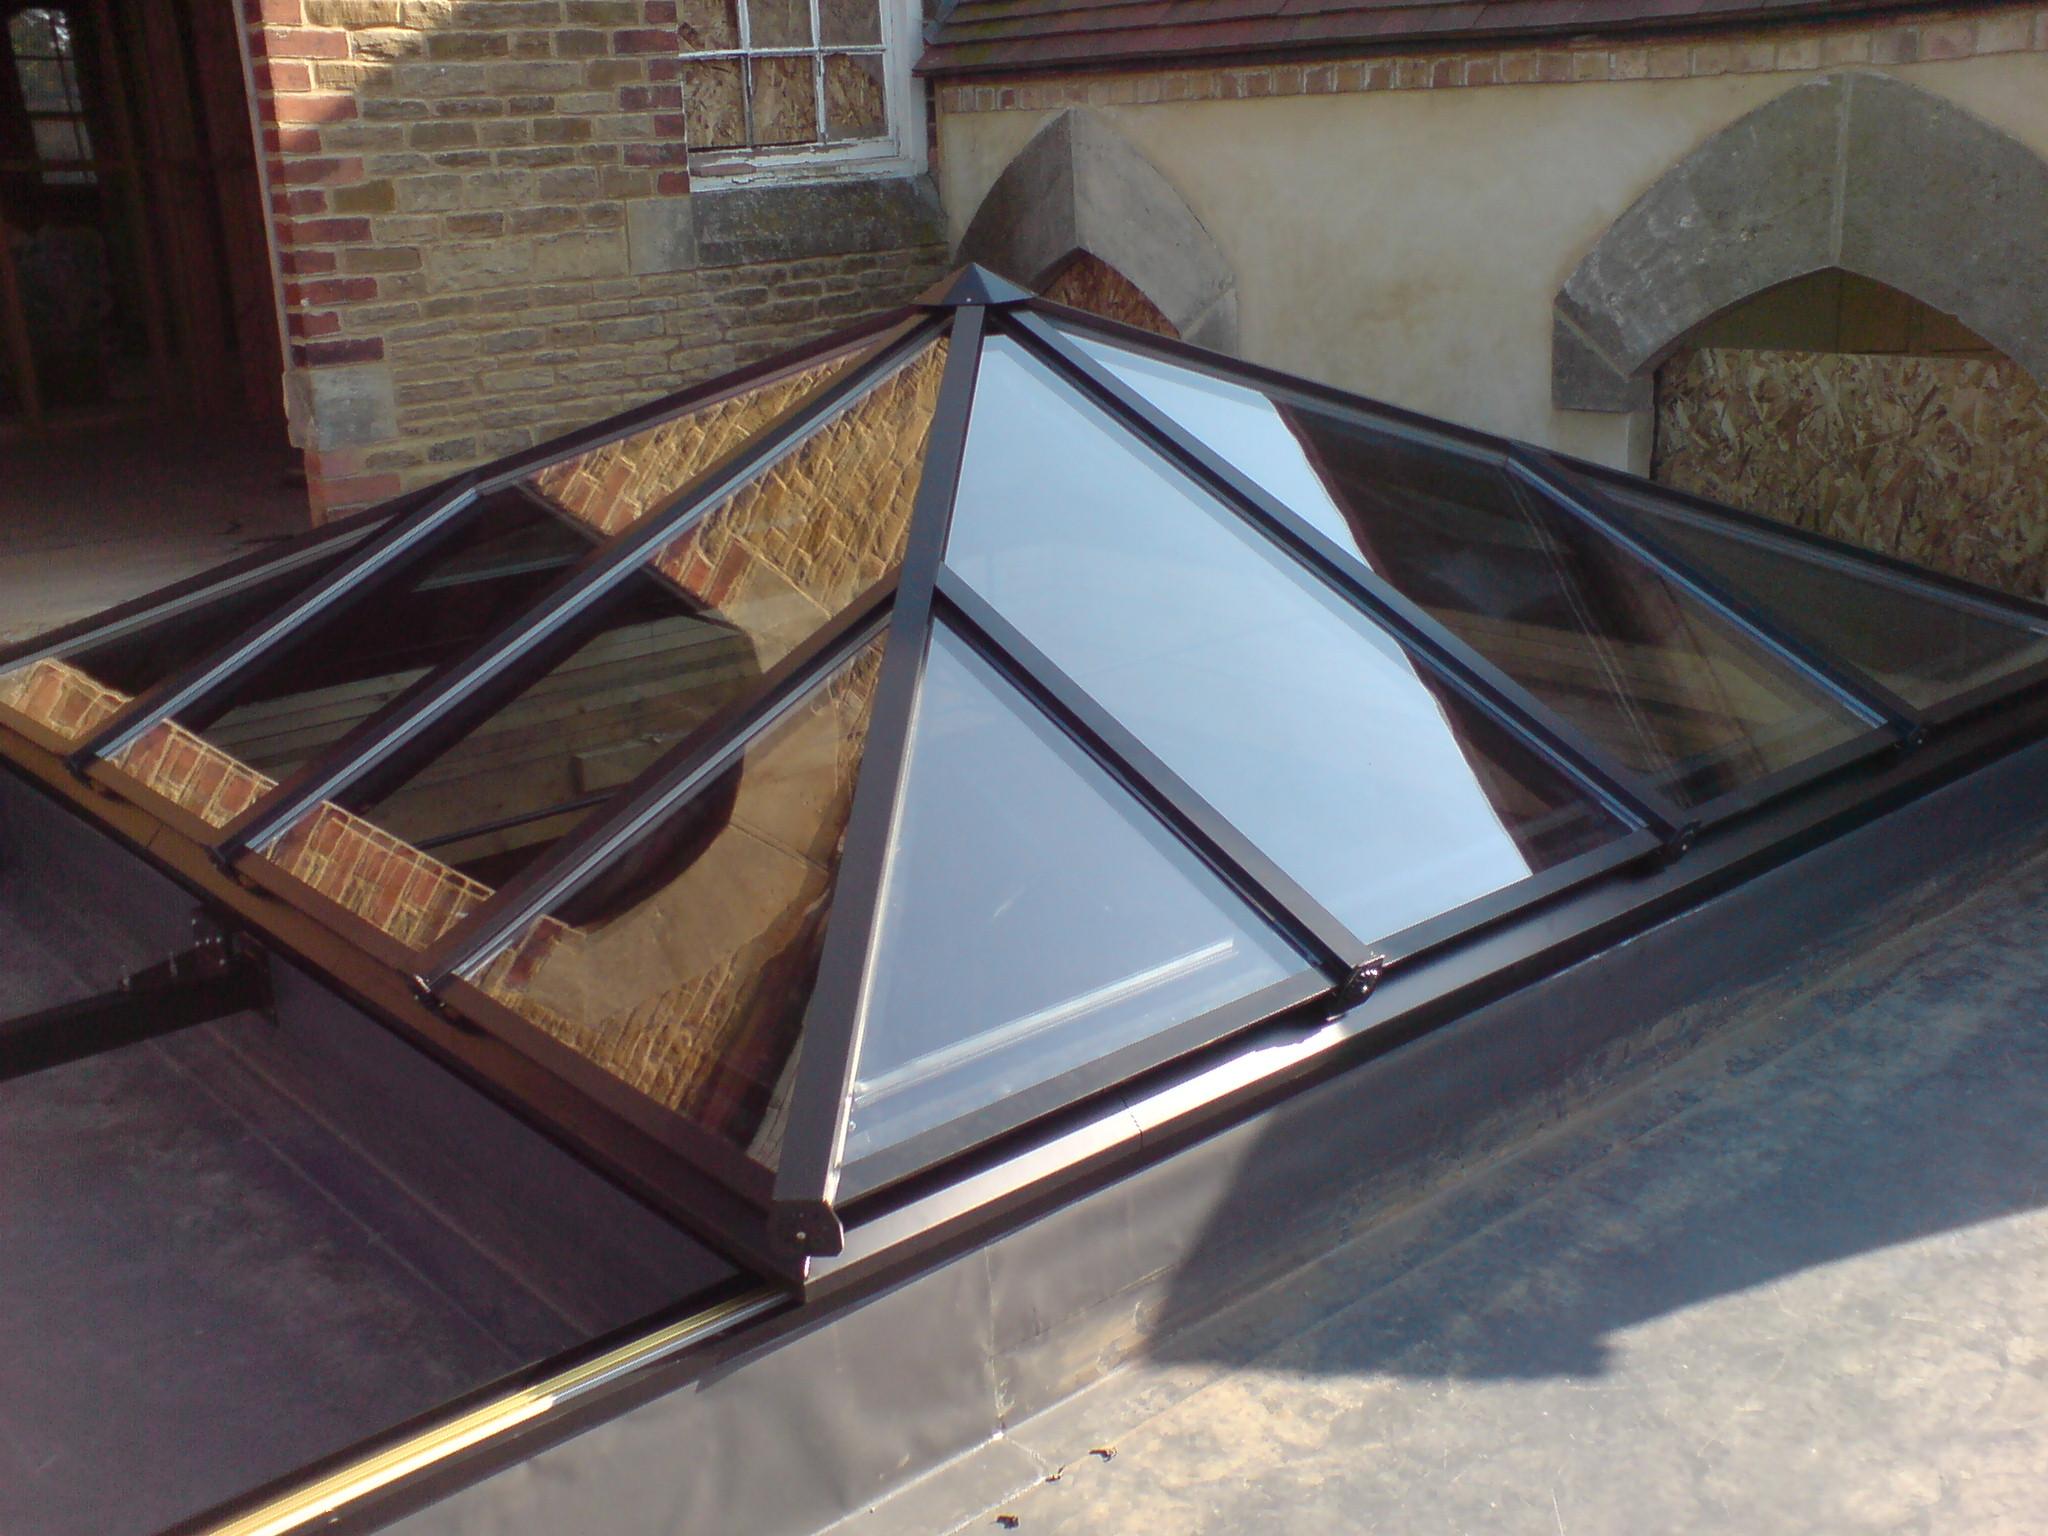 IH Slide Open Fully Retracting Pyramid Roof Lantern, Rooflight, Skylight, Glazed Roof